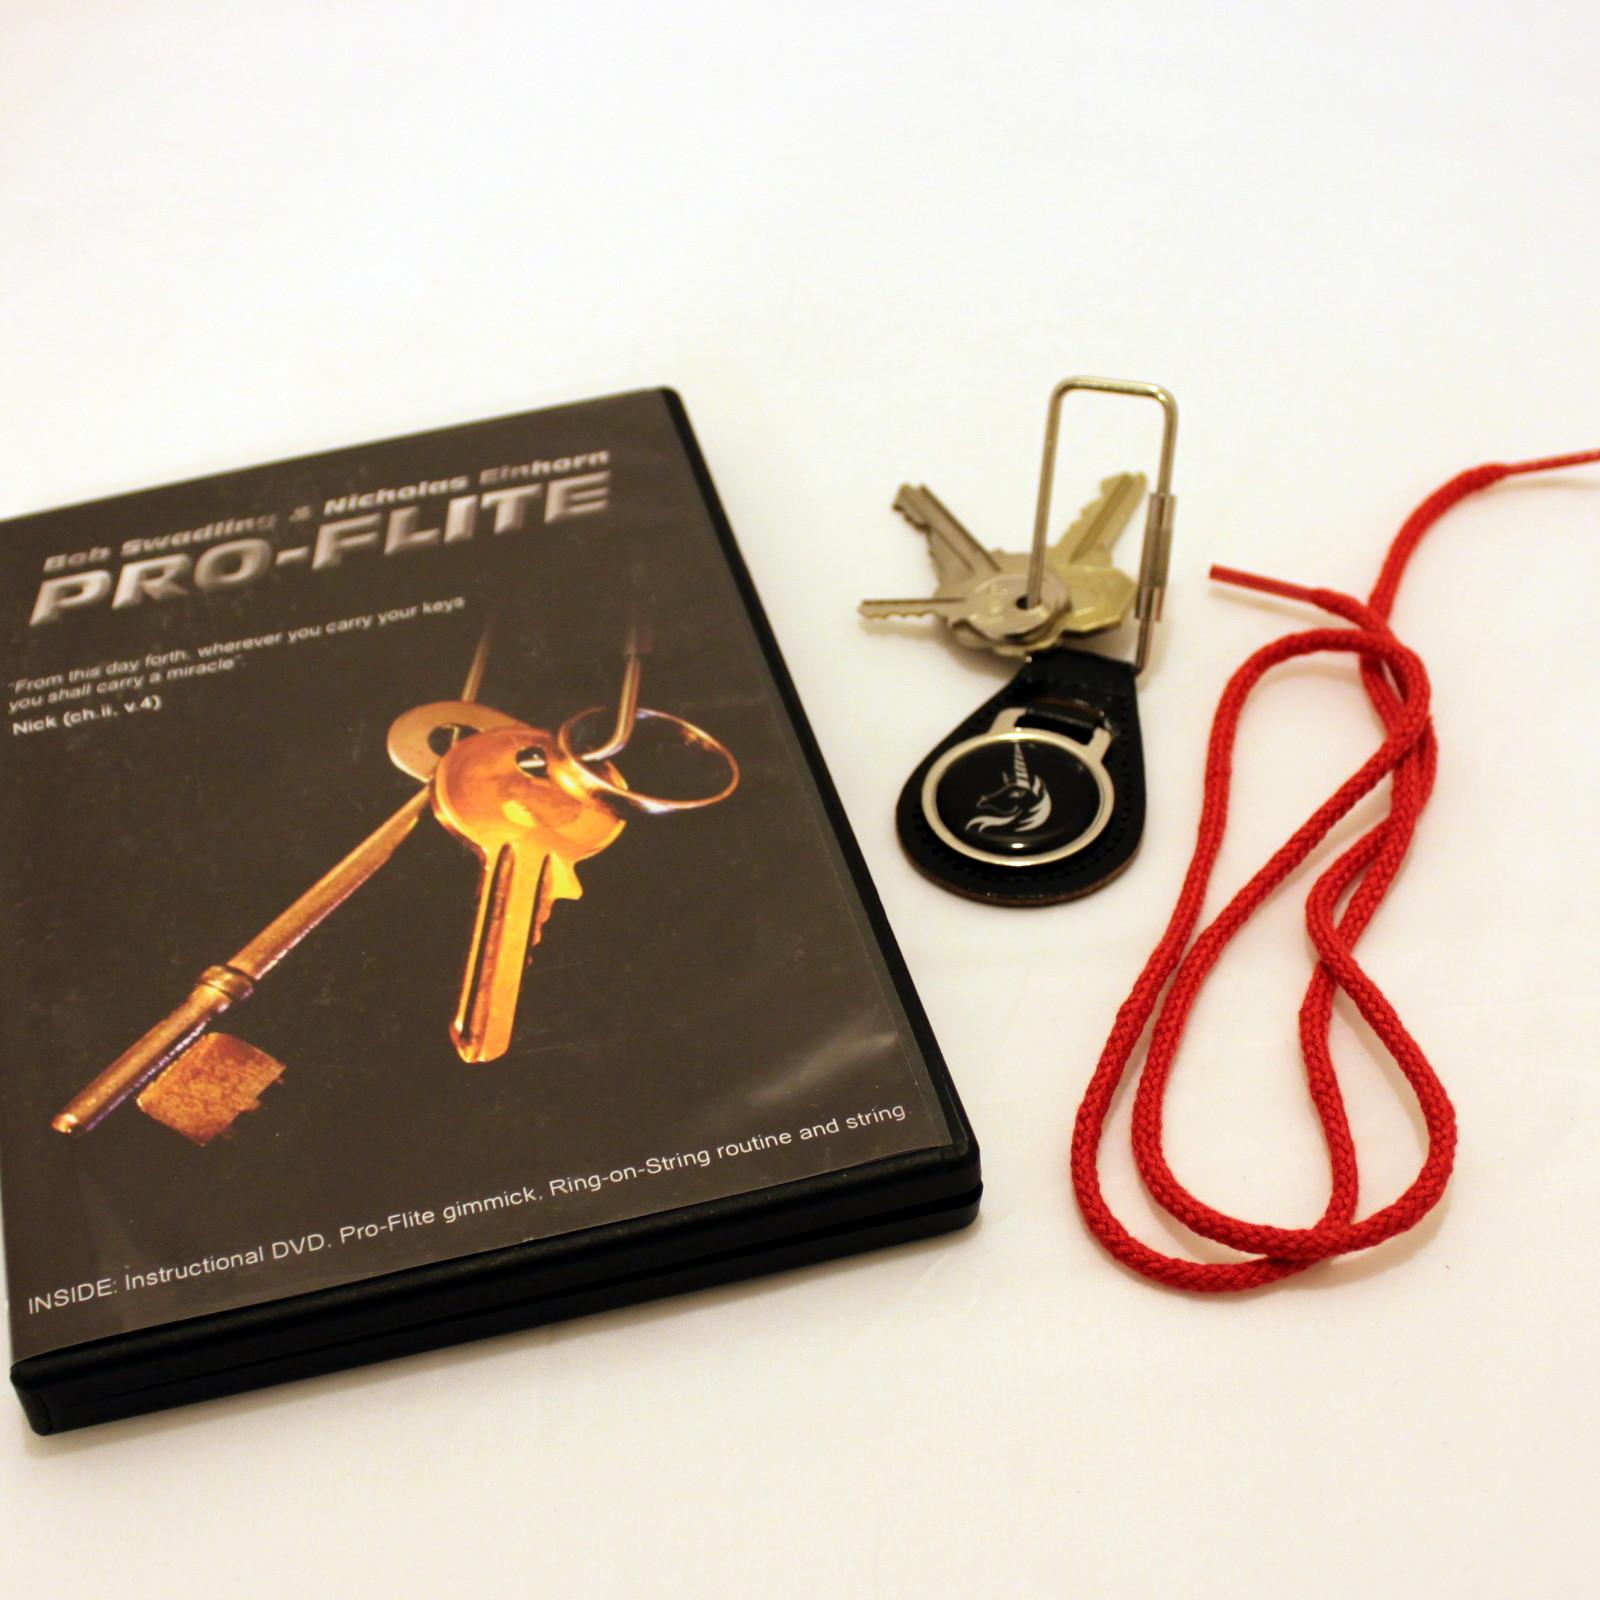 Pro Flite by Nicholas Einhorn, Robert Swadling